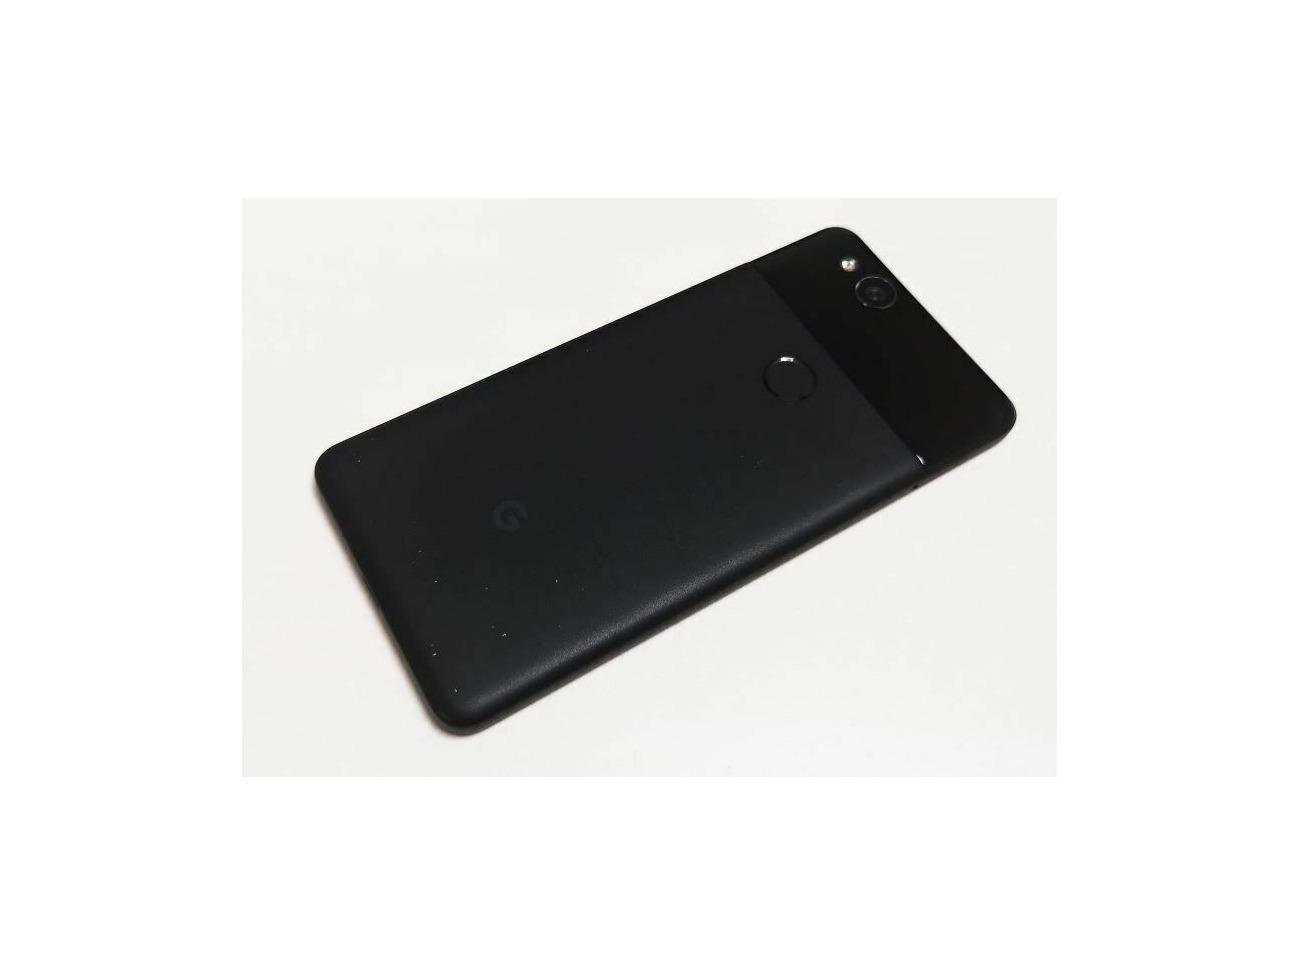 Buy GOOGLE PIXEL 2 G011A VERY GOOD CONDITION - 64GB - BLACK